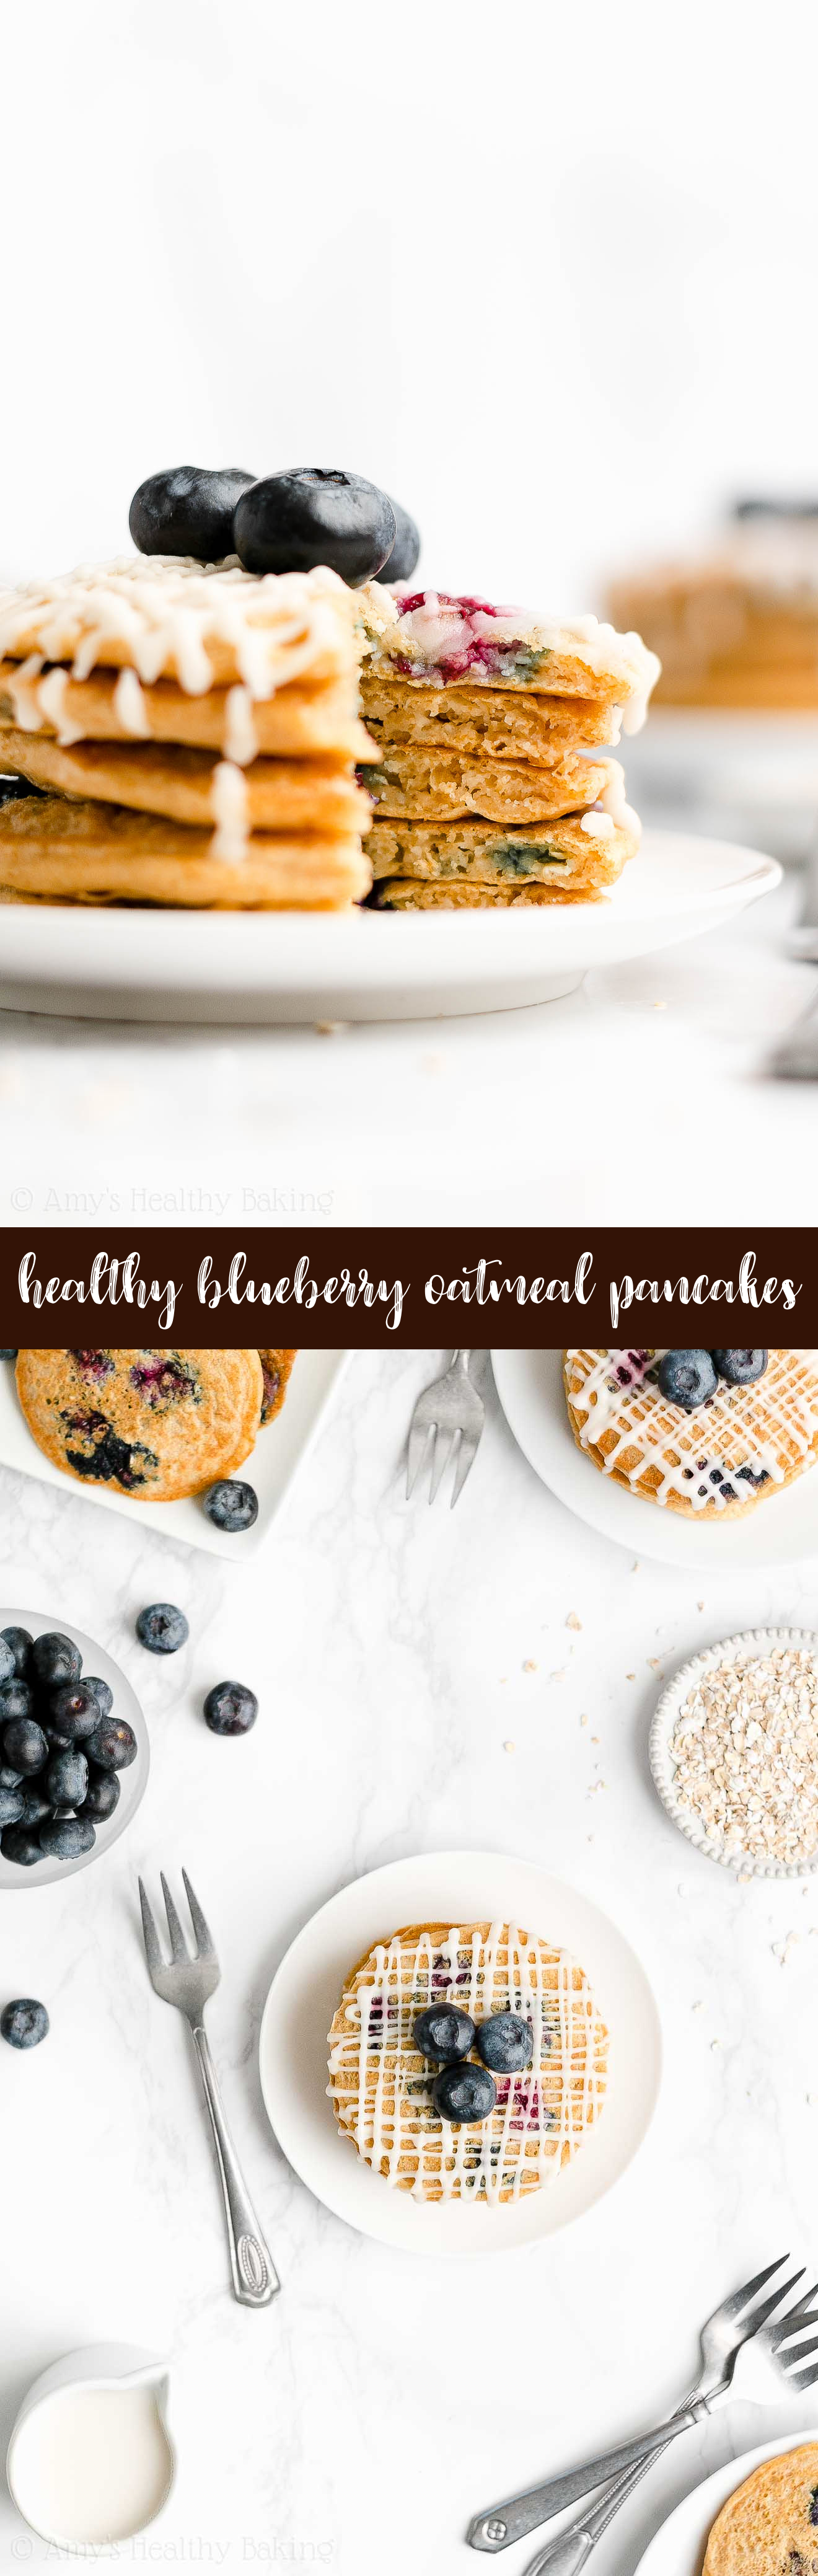 Best Ever Easy Healthy Fluffy Greek Yogurt Blueberry Oatmeal Pancakes